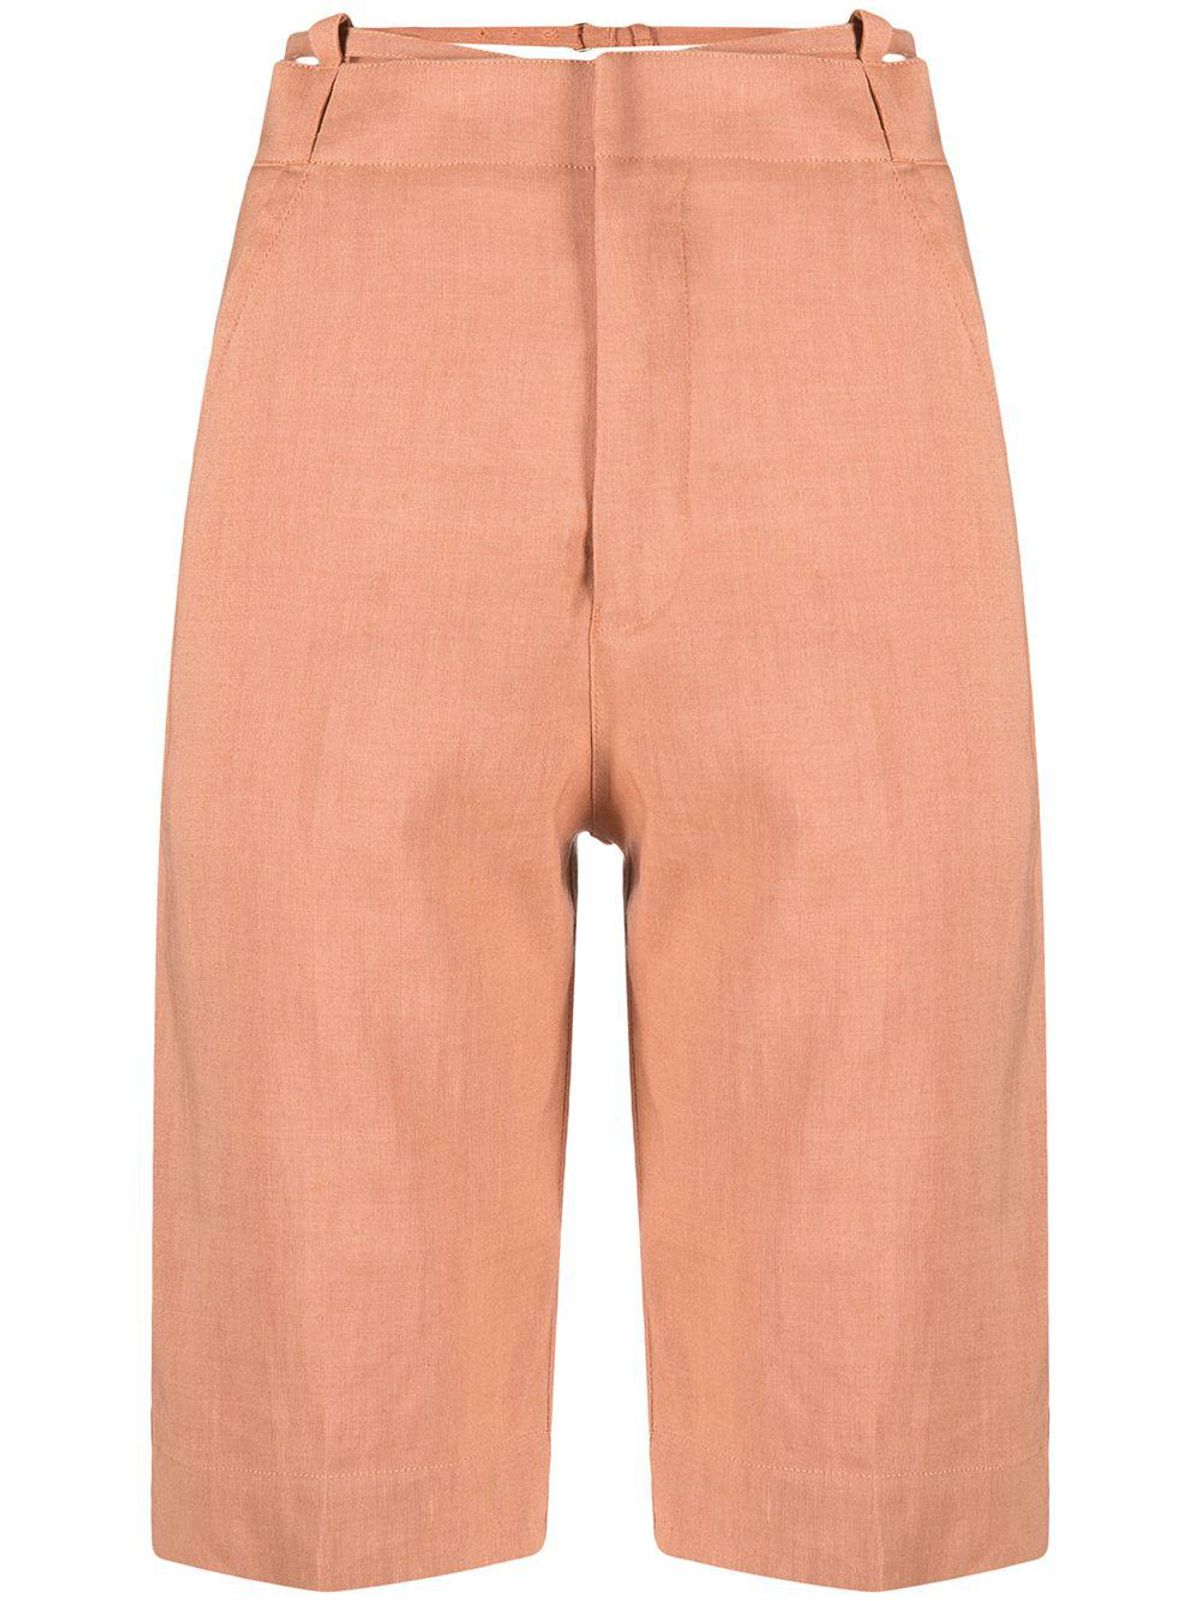 Le Short Gardian Shorts